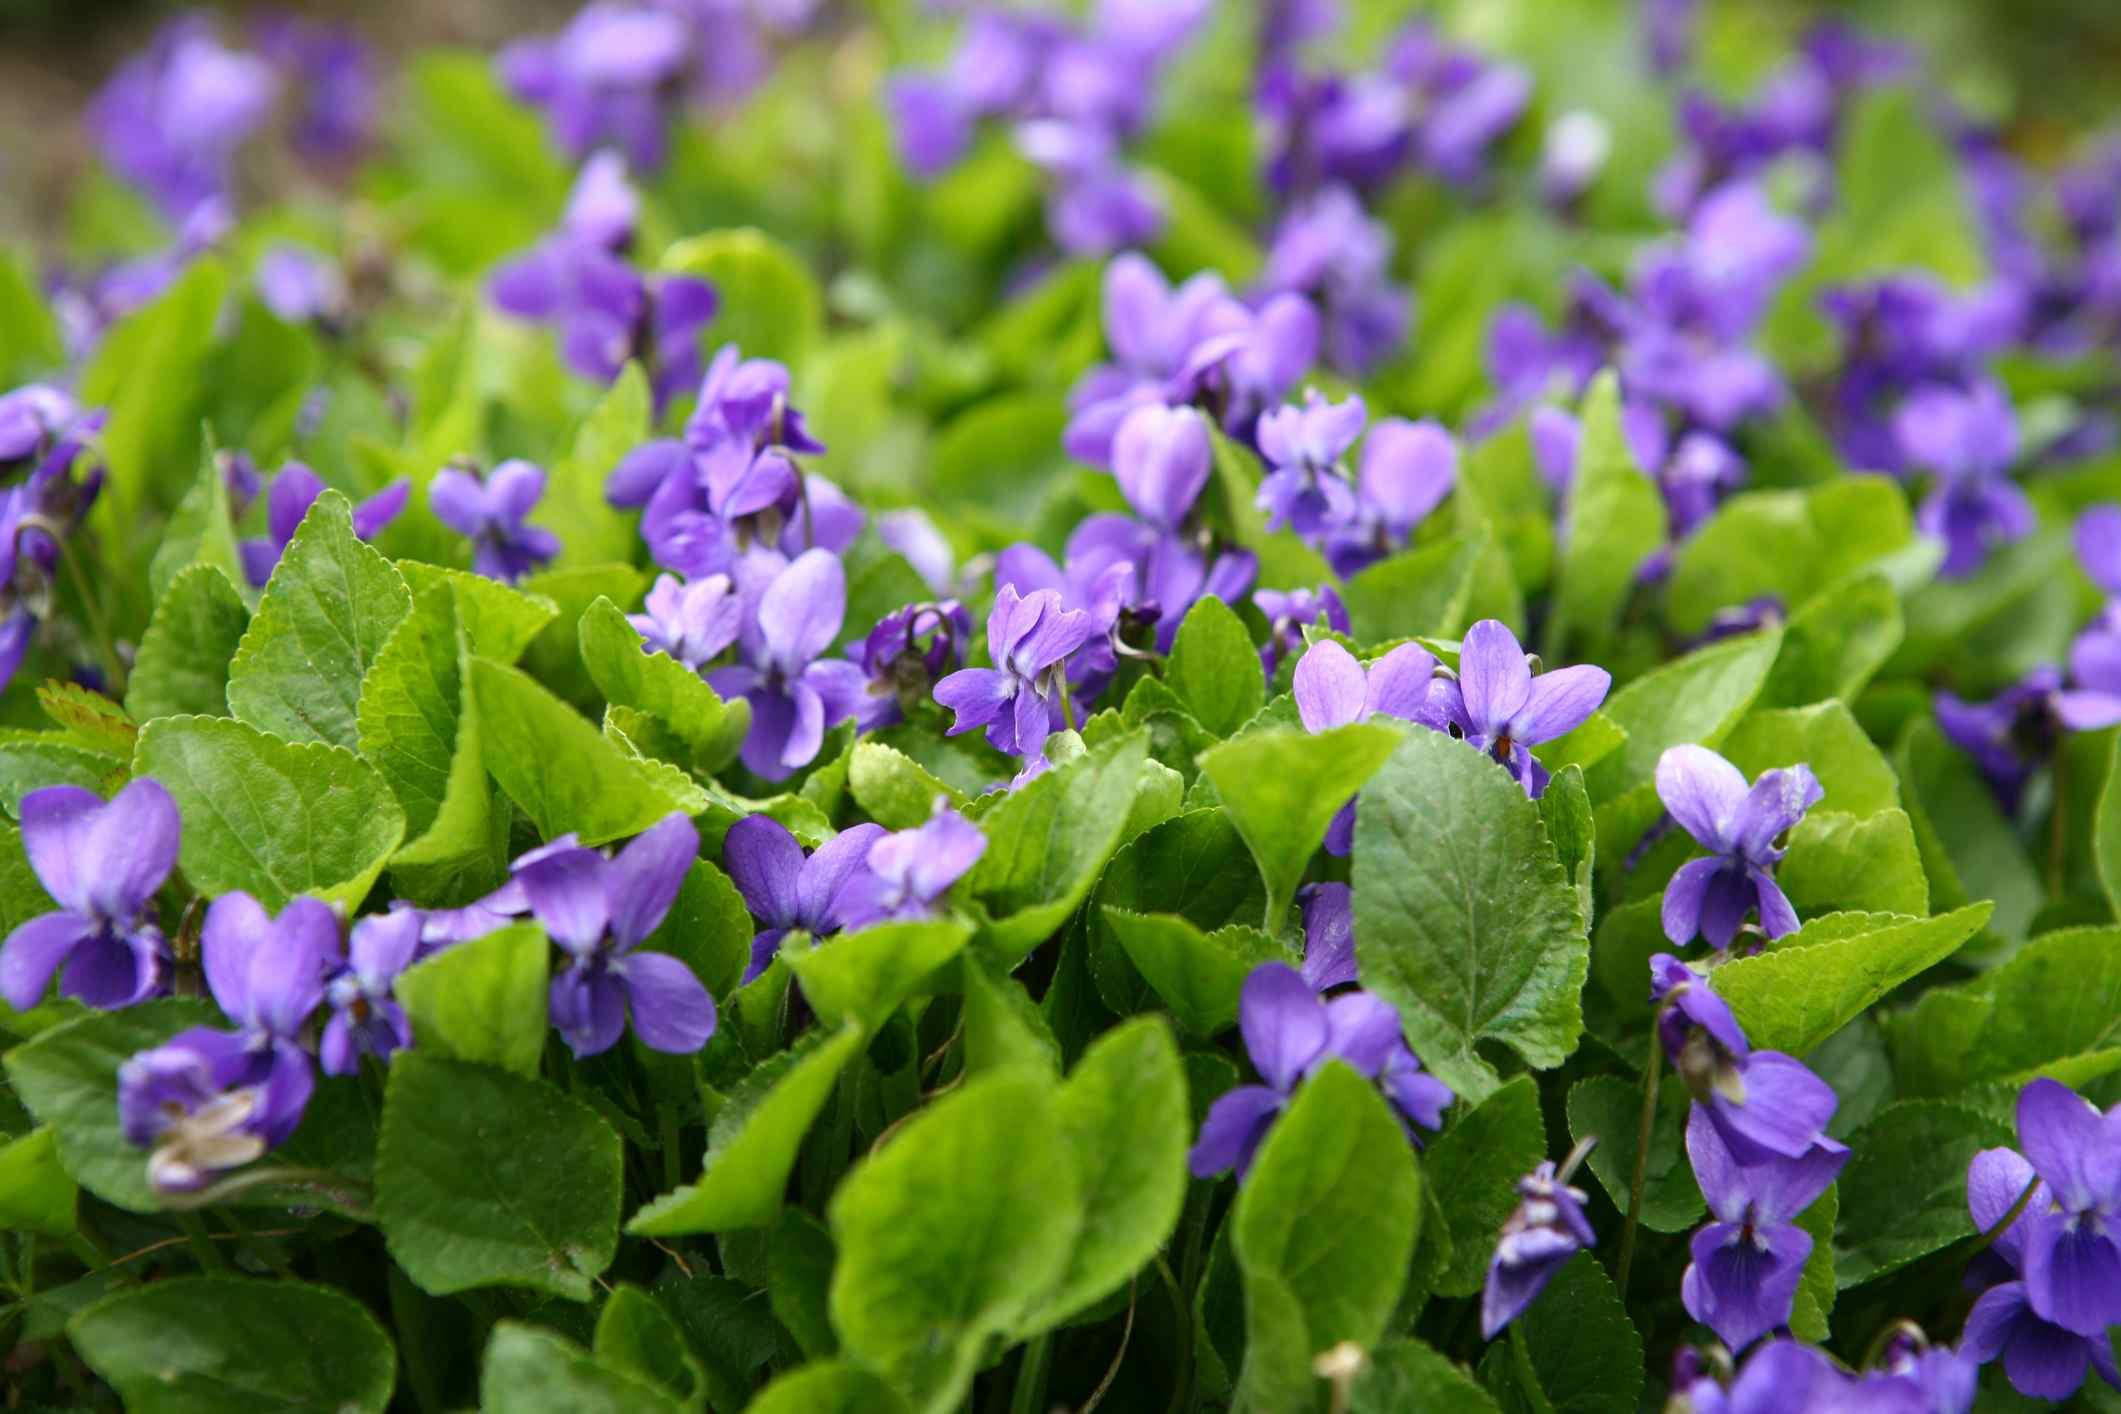 Flores de viola púrpura que crecen en masa